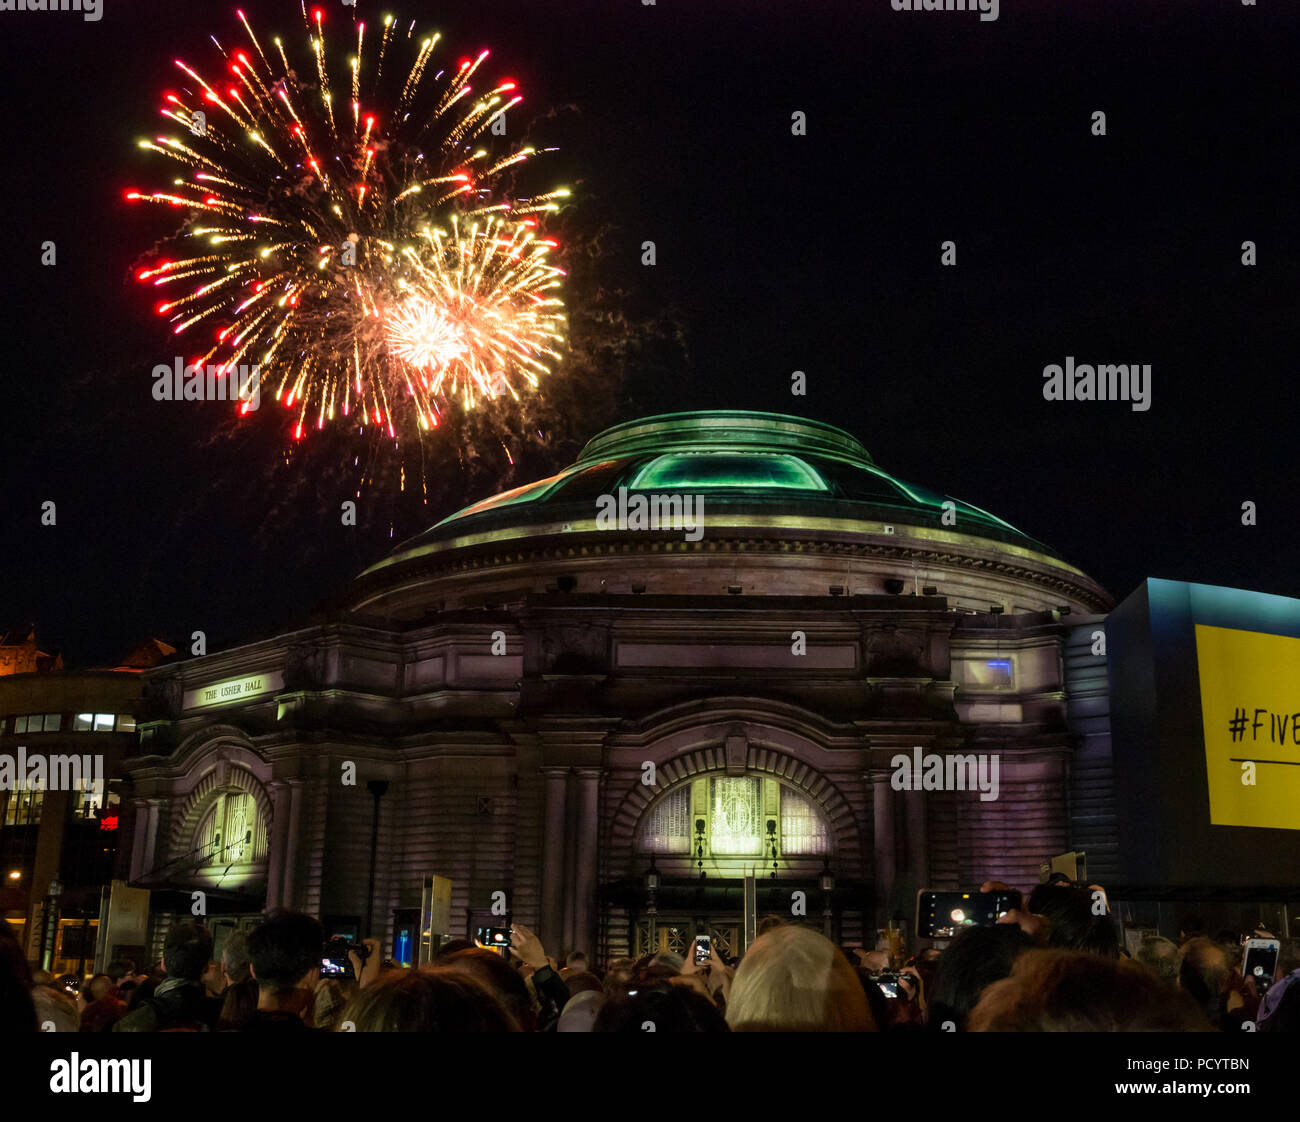 Fireworks over Usher Hall from Edinburgh Military Tattoo as crowd waits for opening event of EIF, Five Telegrams, Edinburgh, Scotland, UK Stock Photo